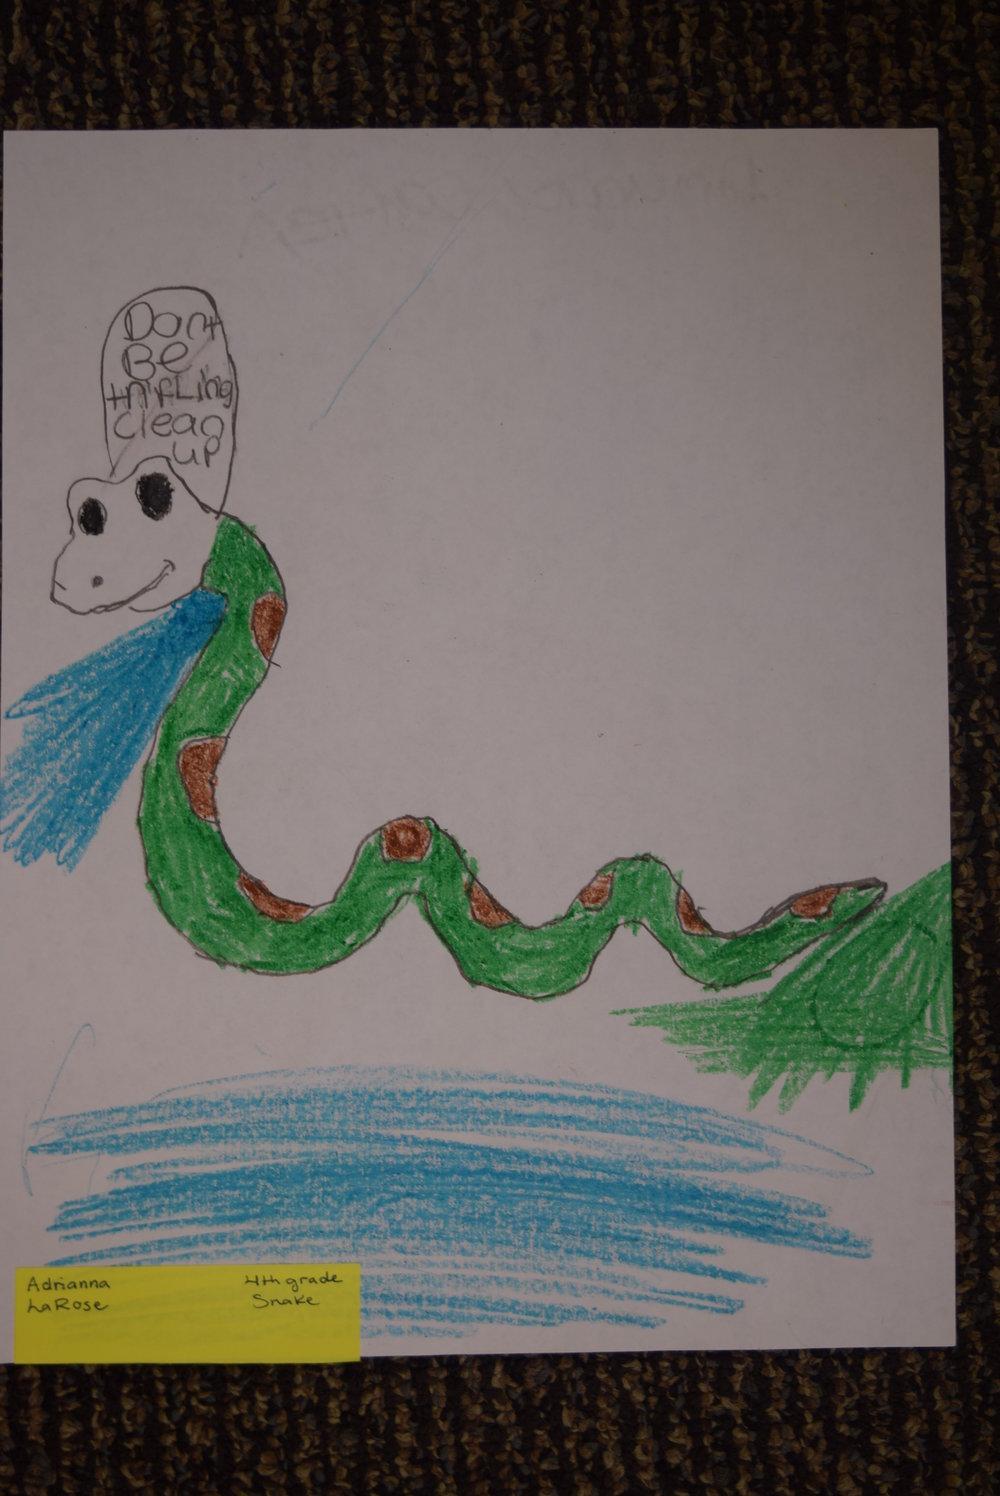 Adrianna- LaRose, 4th grade